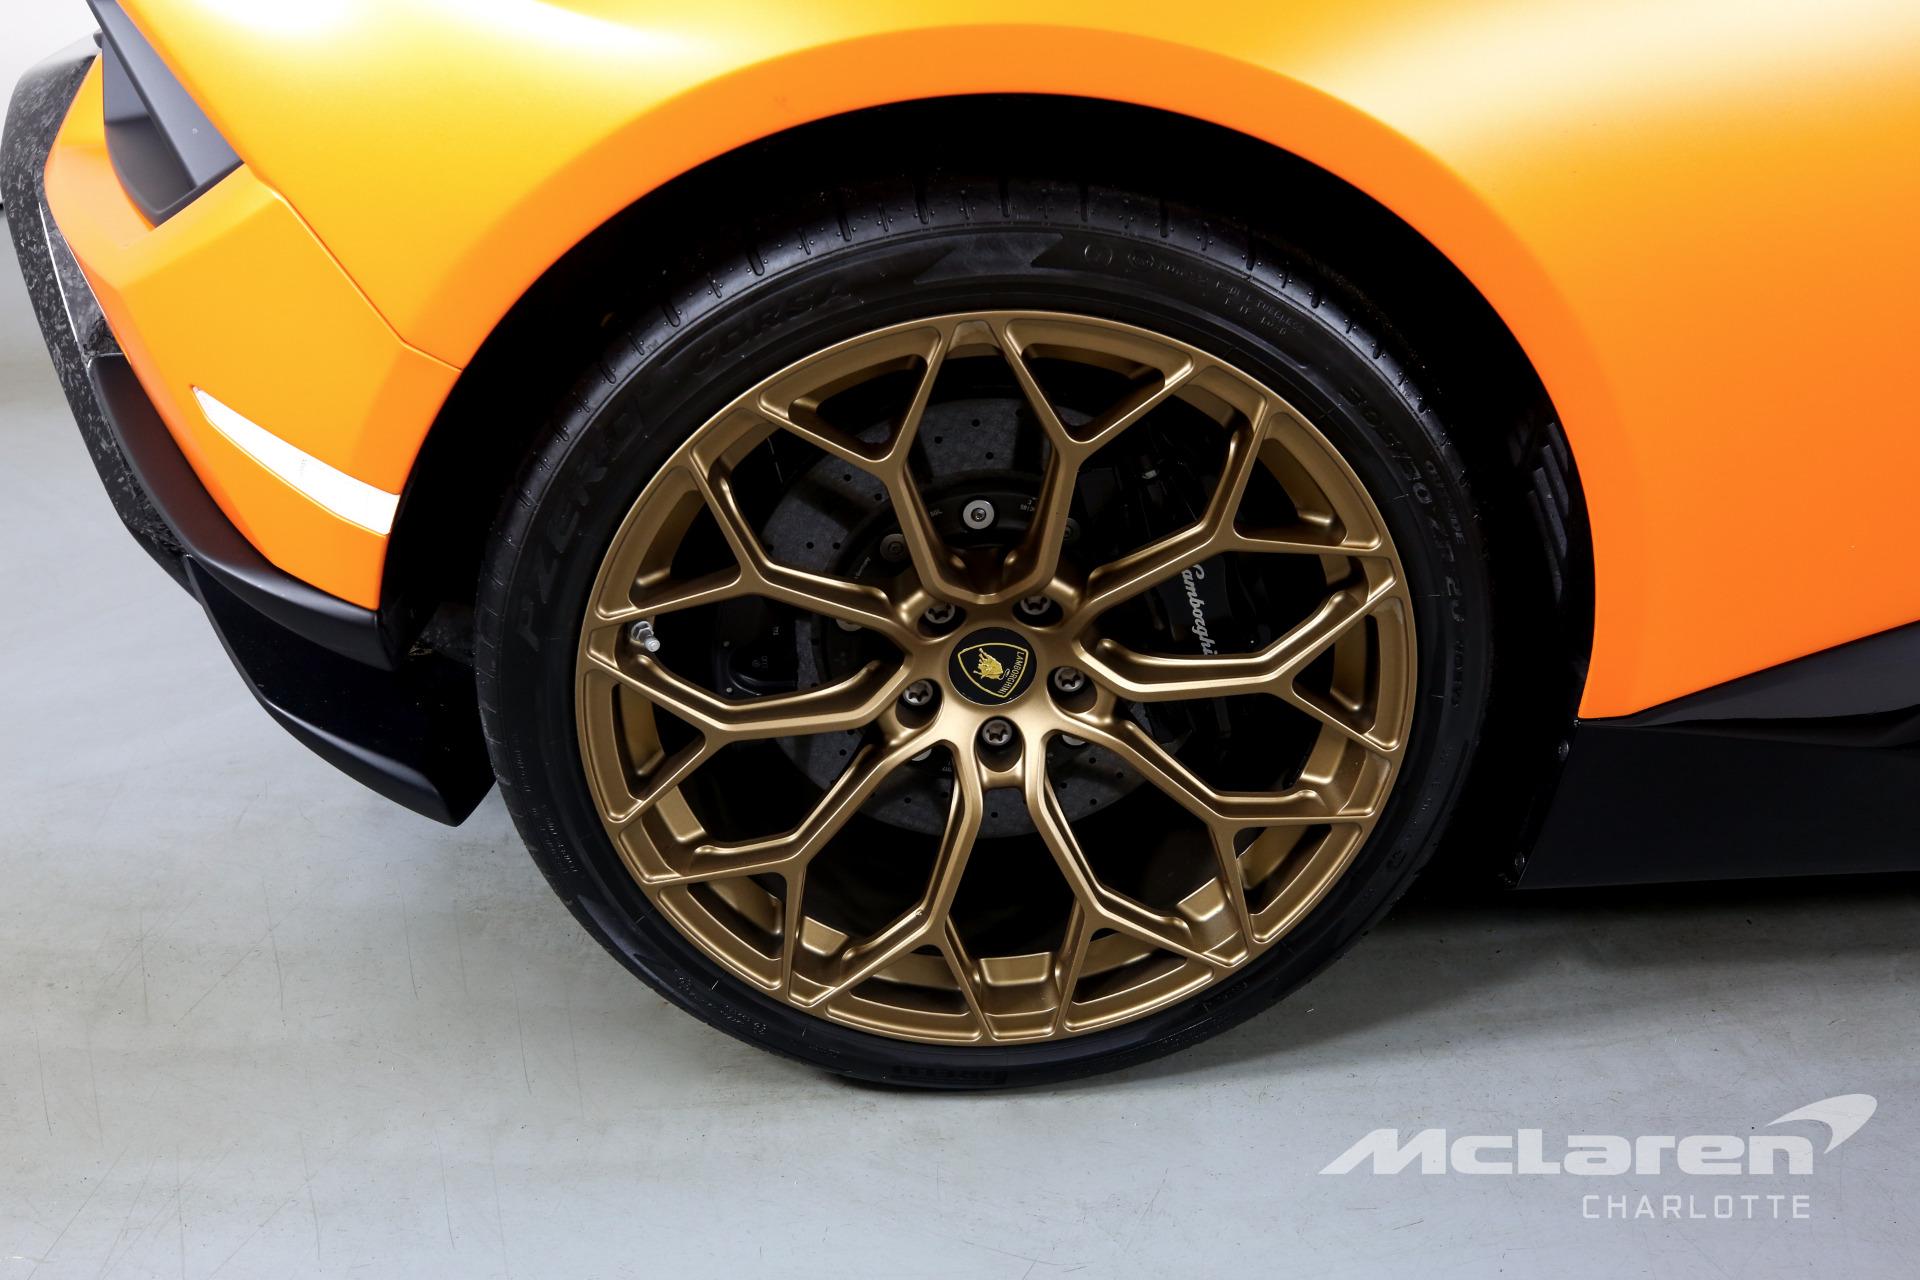 Used 2018 Lamborghini Huracan LP 640-4 Performante | Charlotte, NC